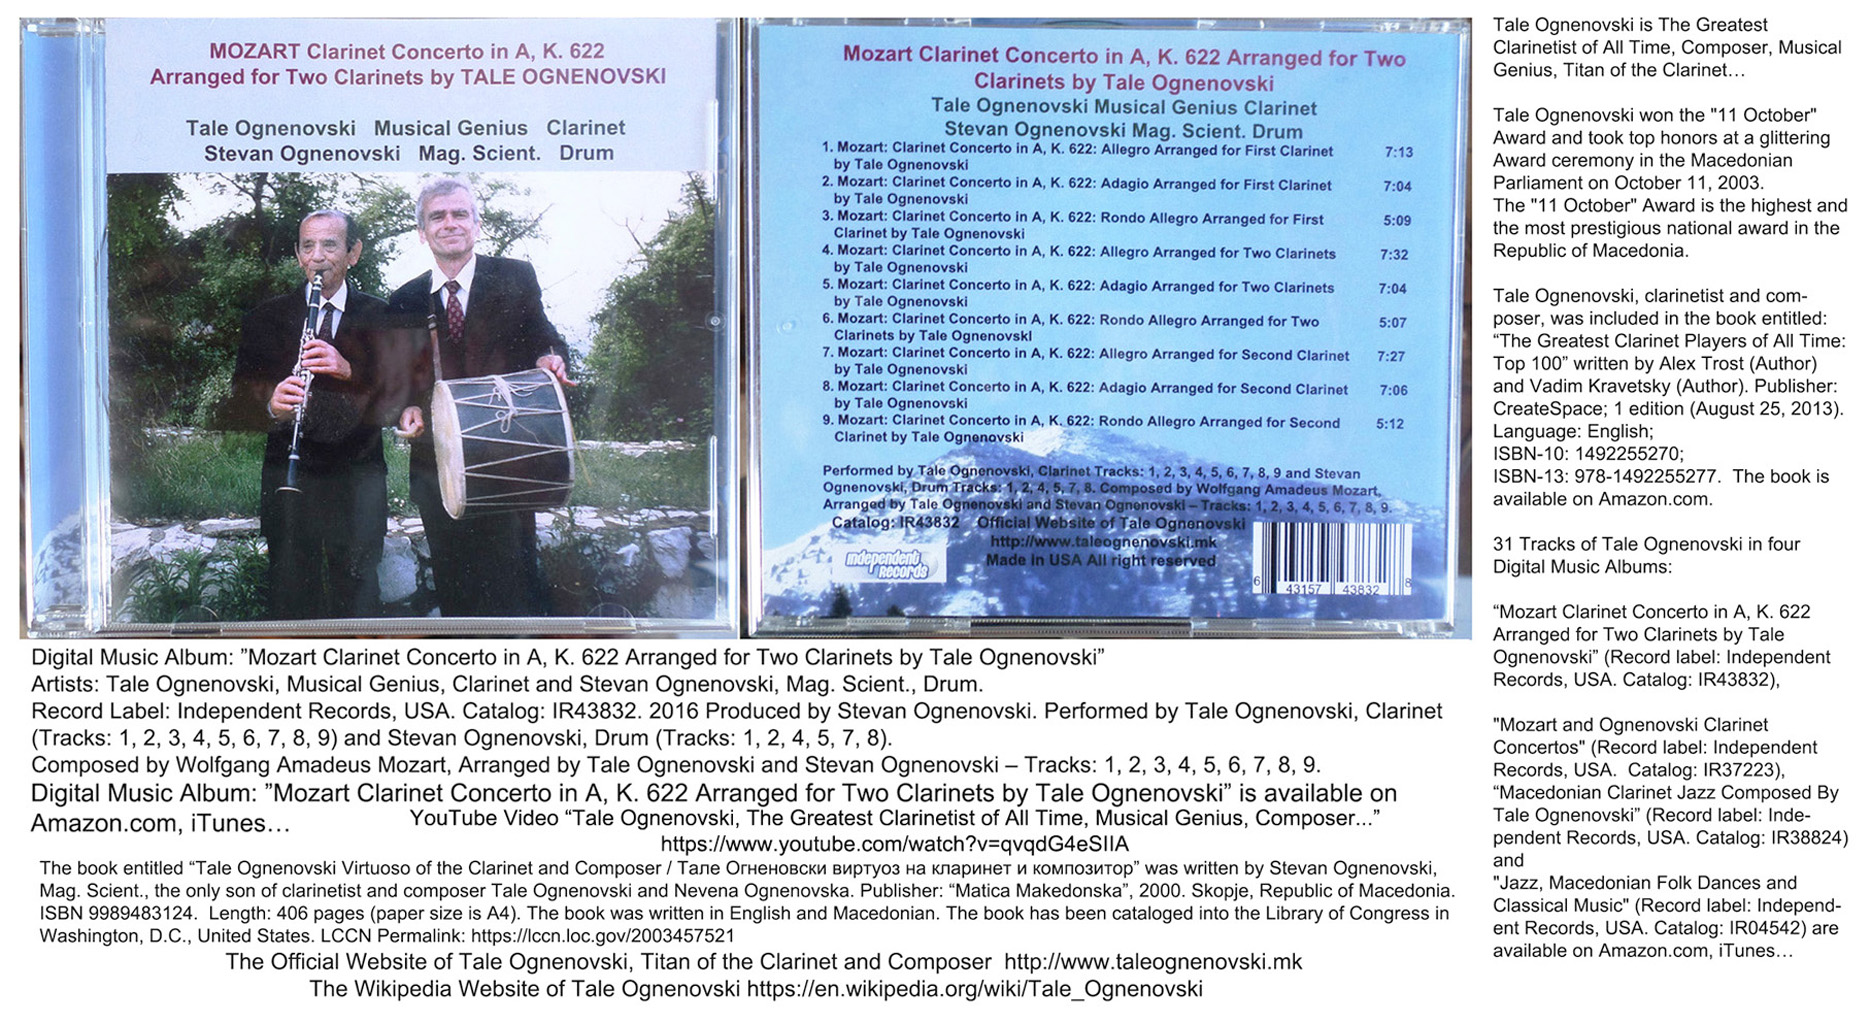 "CD: ""MOZART and OGNENOVSKI Clarinet Concertos"", Tale"